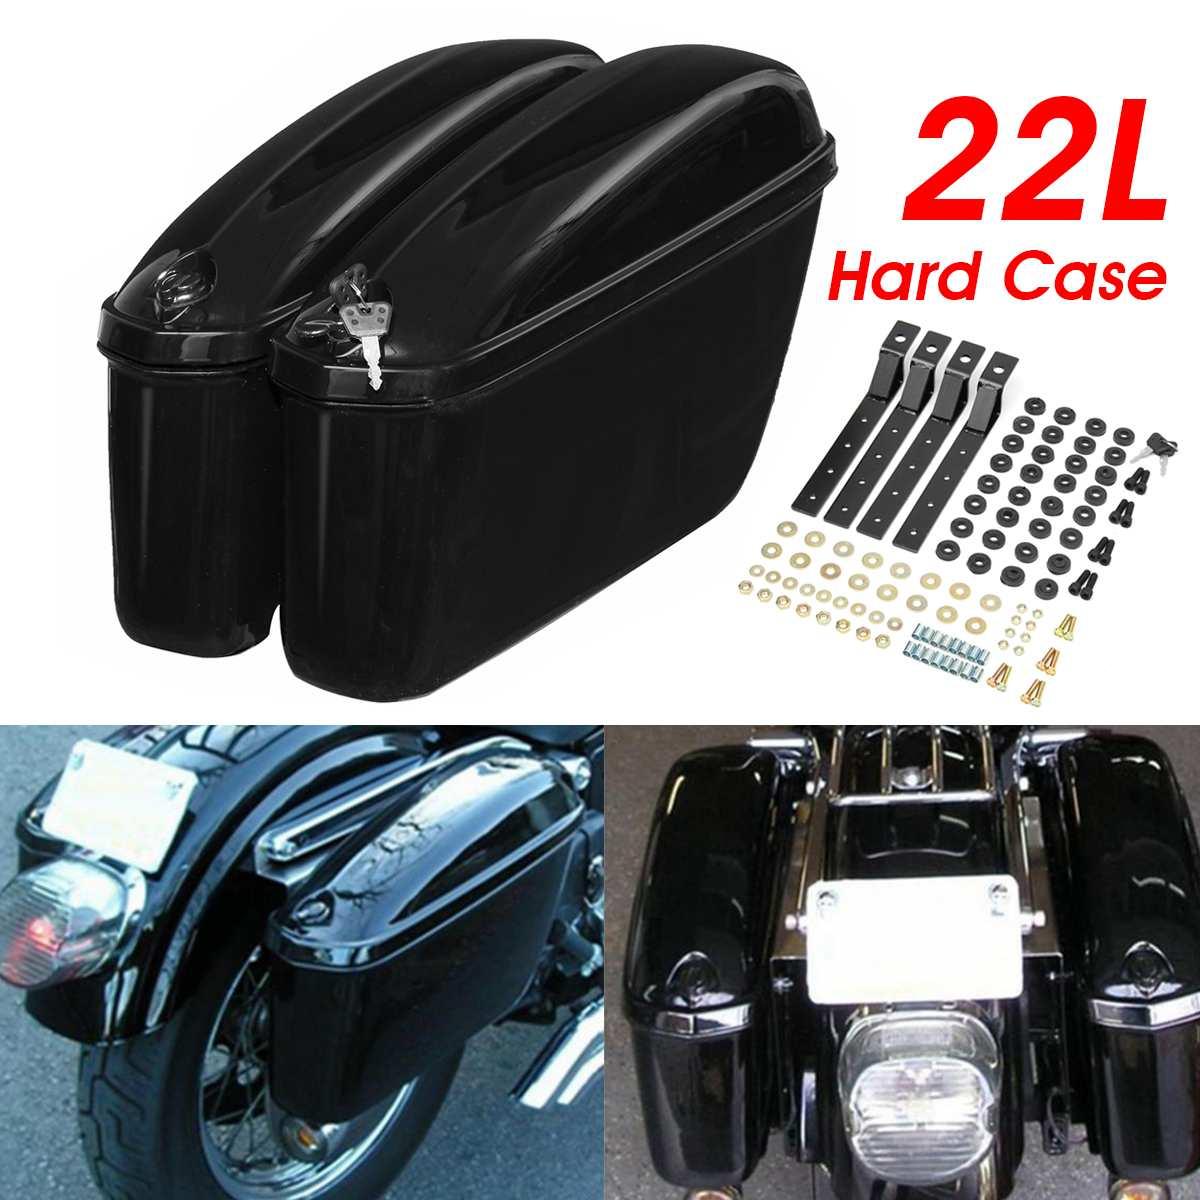 Par Universal 22L de alforjas lado duro maletero caso, herramienta de almacenamiento de equipaje maleta para Honda/Yamaha/Suzuki